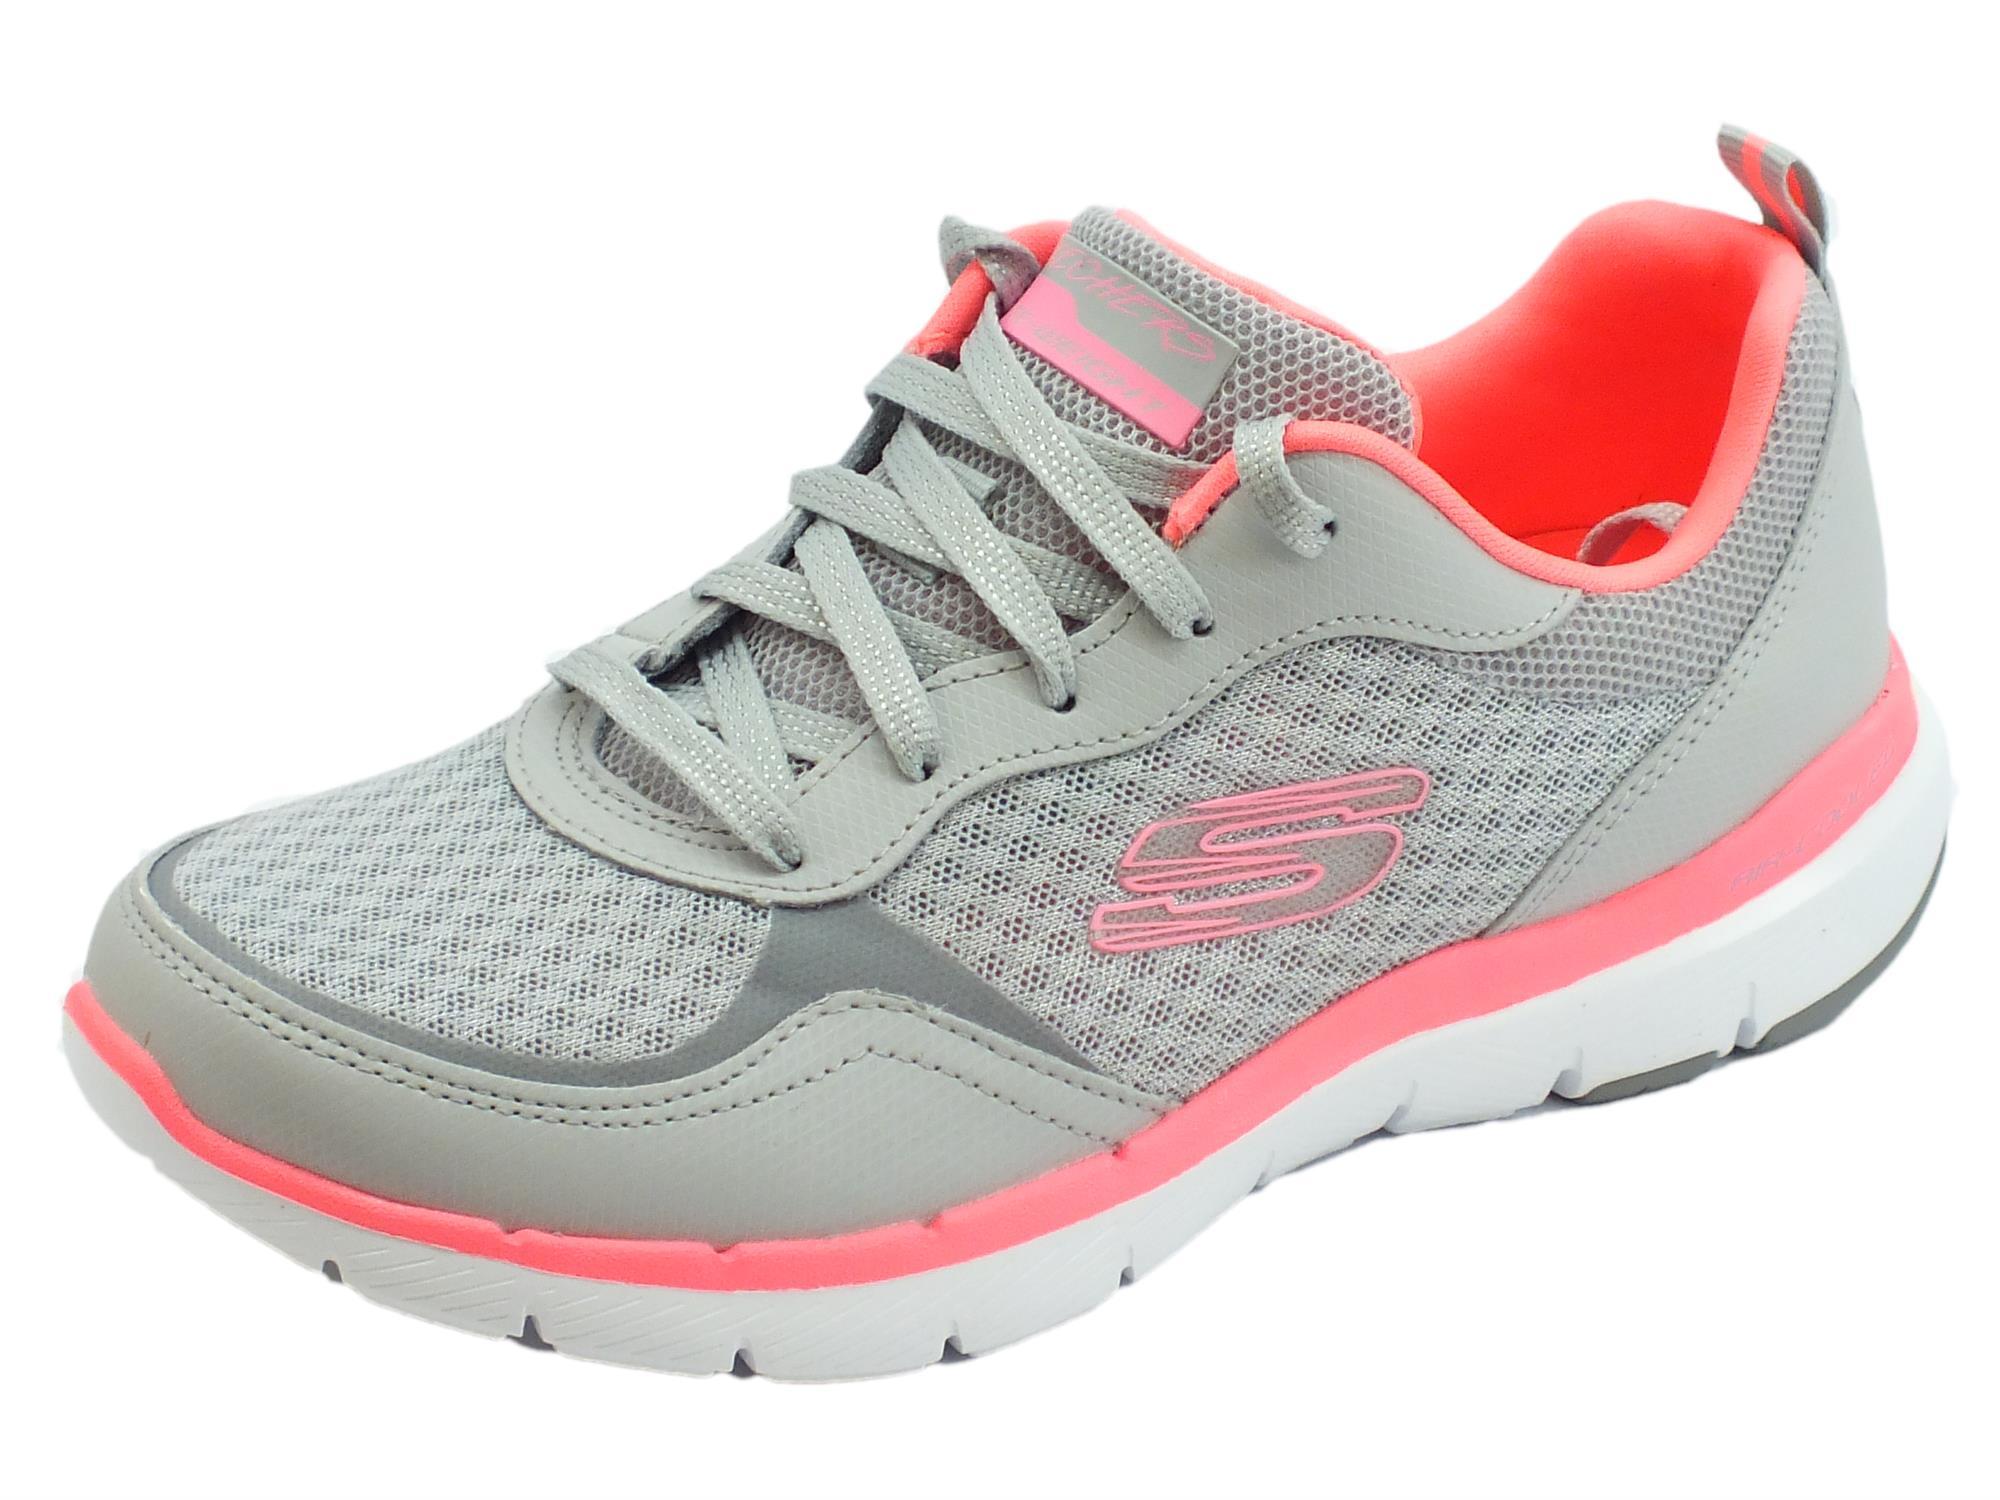 6af4bcf85276a4 Skechers Flex Appeal 3.0 Go Forward scarpe sportive per donna grigie e rosa